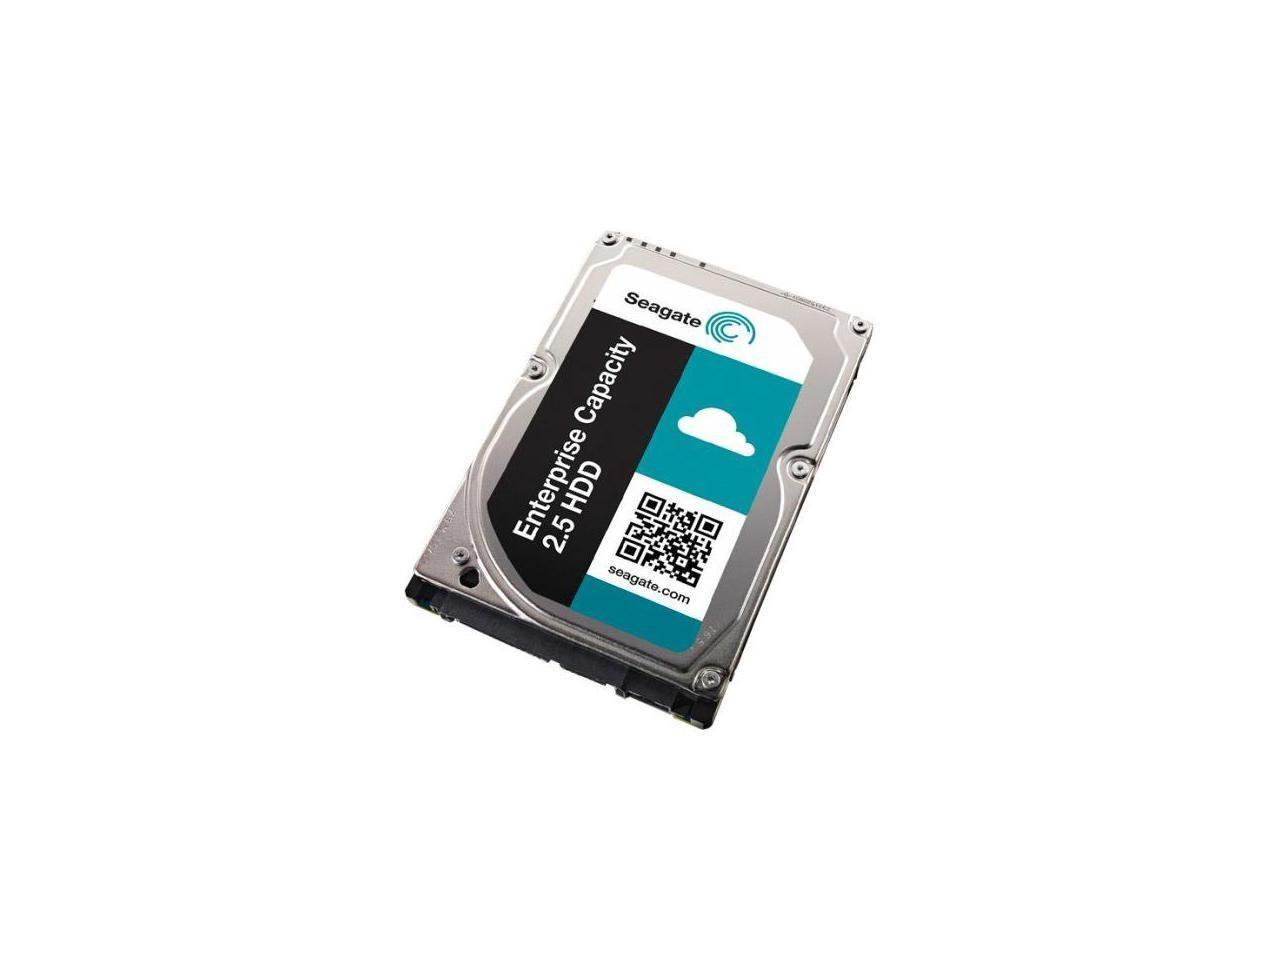 1TB Seagate ST1000NX0323 7200RPM SAS 12GB/s 2.5 Internal HDD